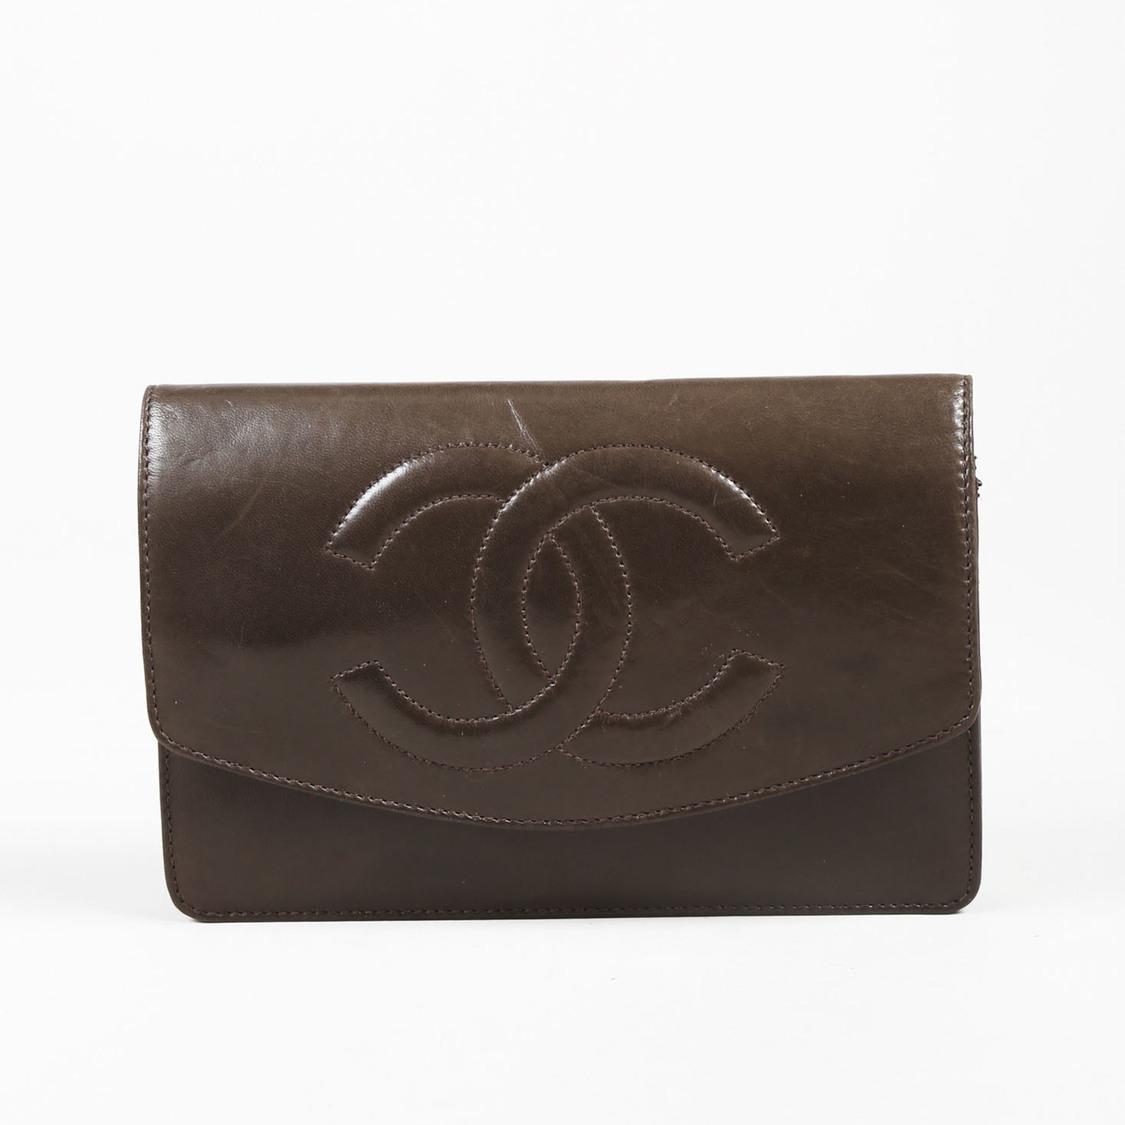 8b814c43a04edd Chanel Vintage Brown Lambskin Leather